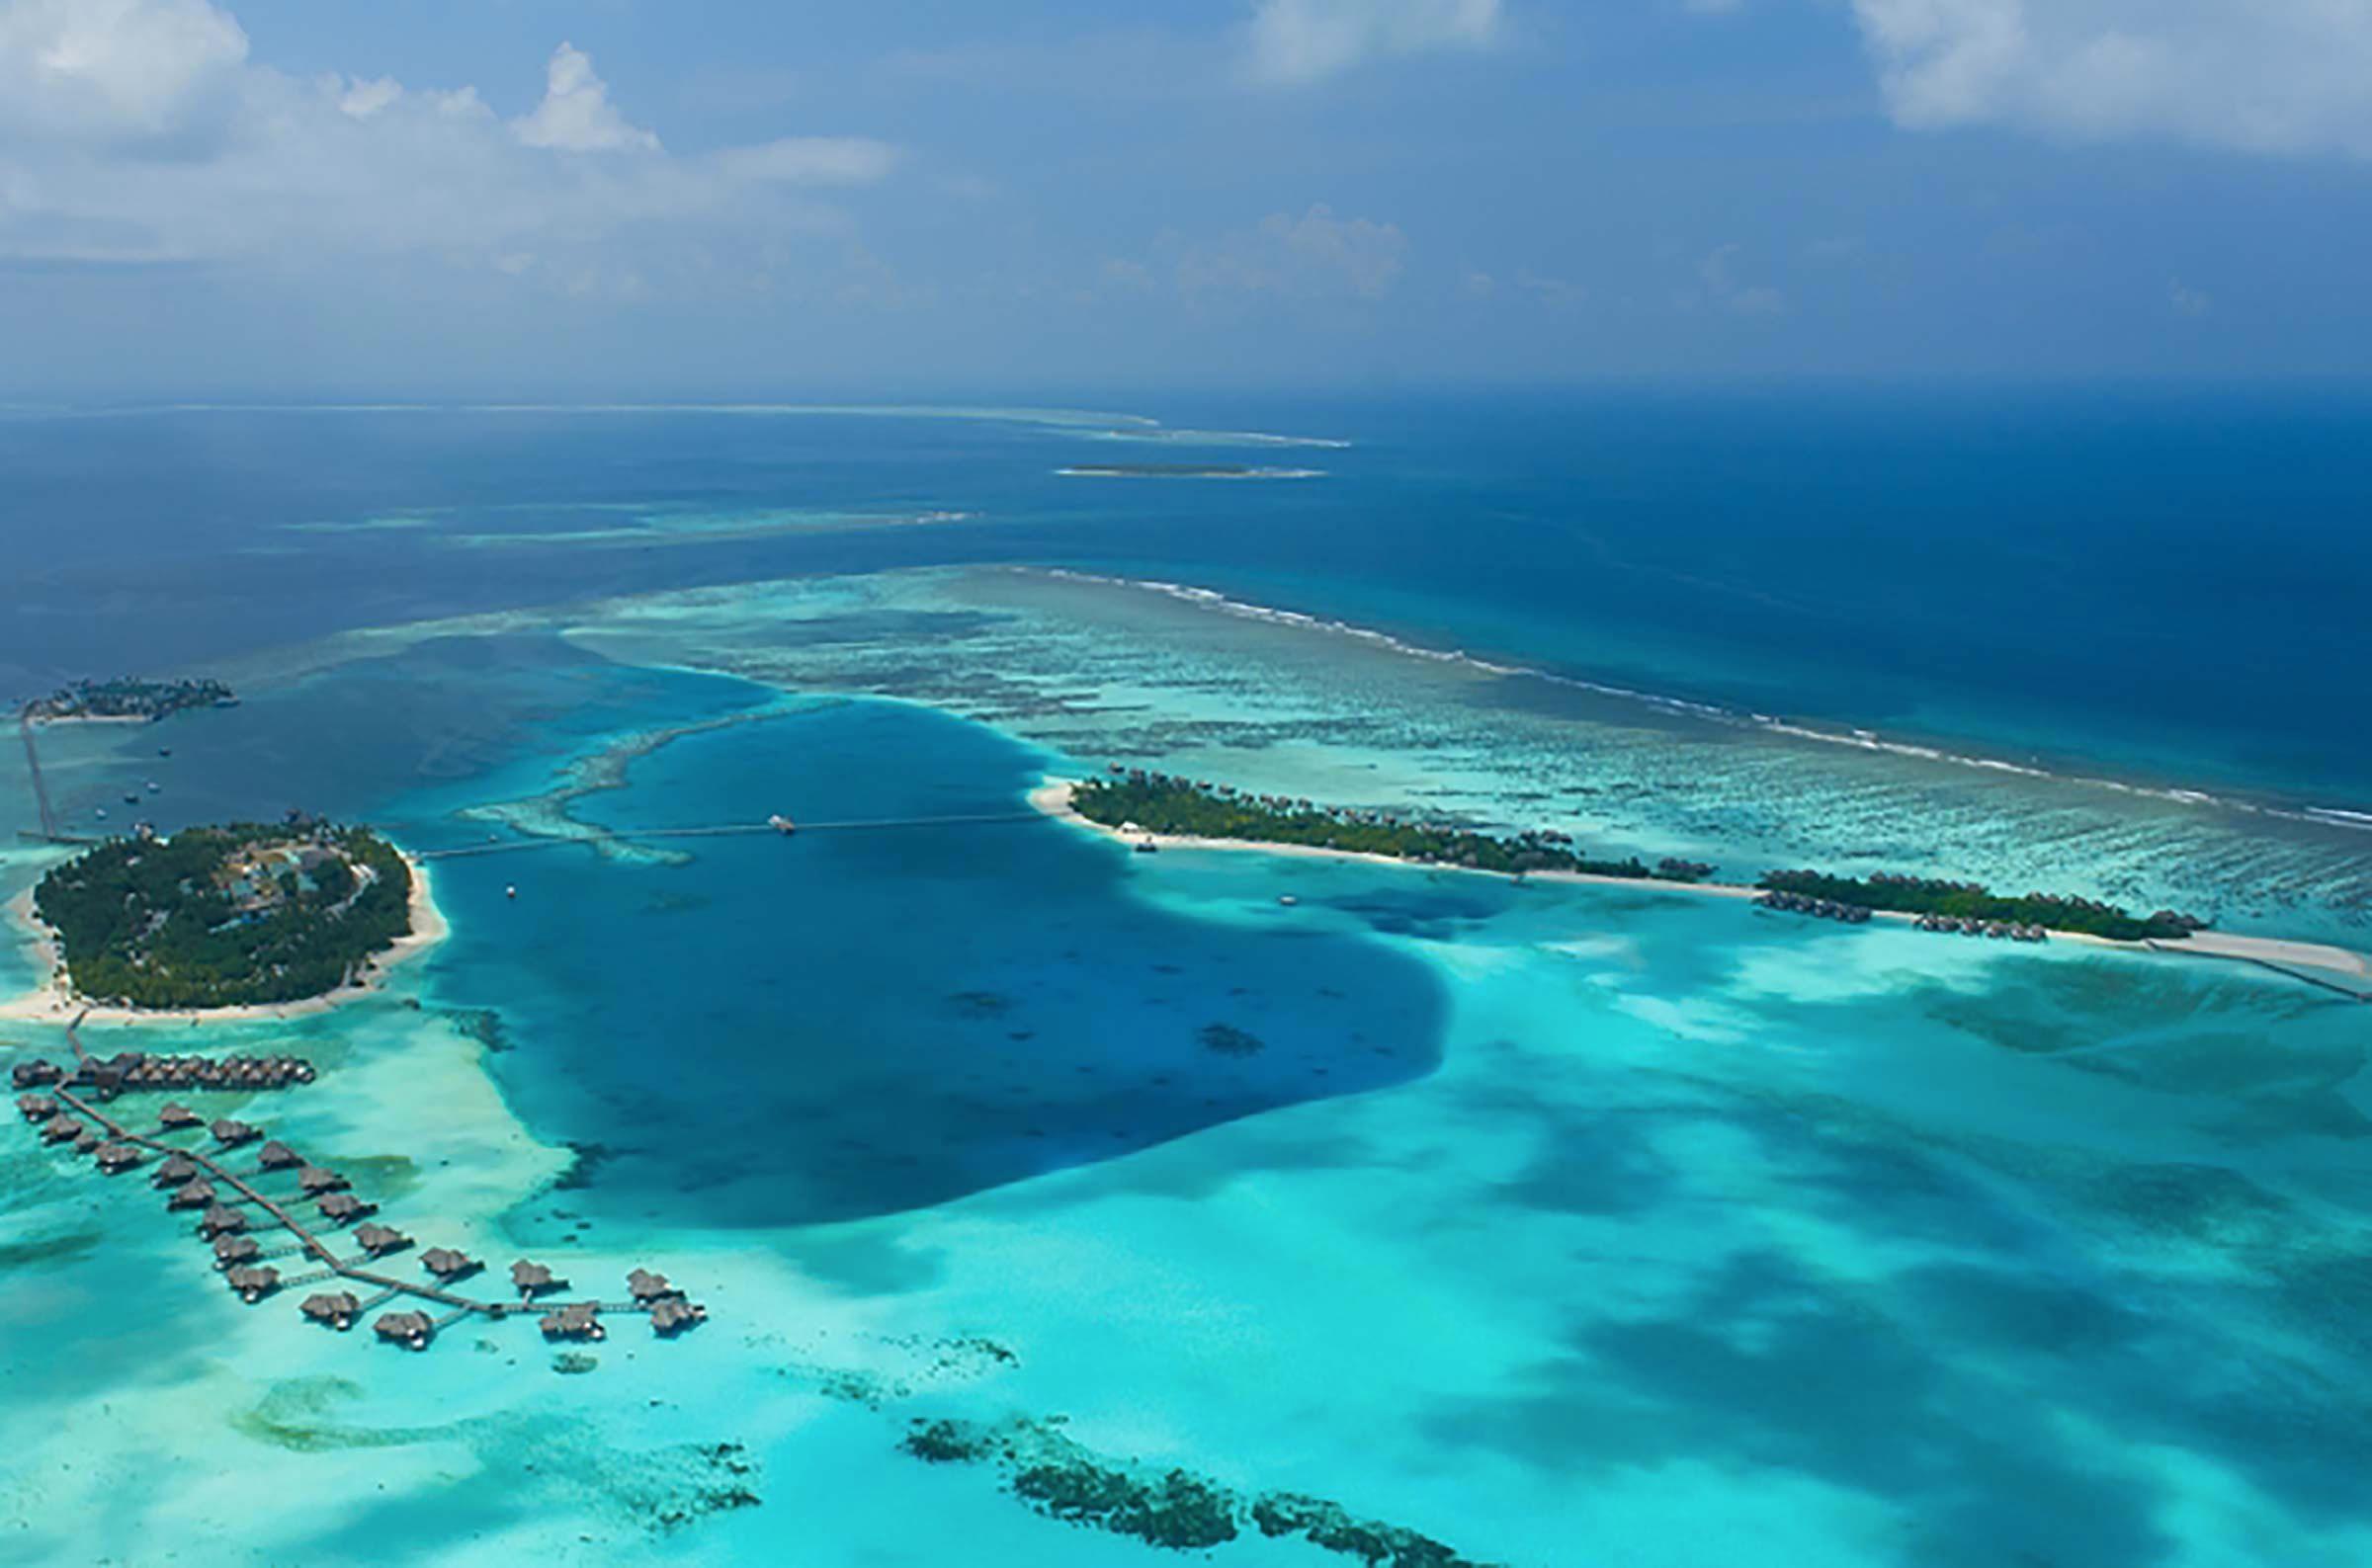 Séjour insolite au Hilton Conrad Maldives Rangali Island.